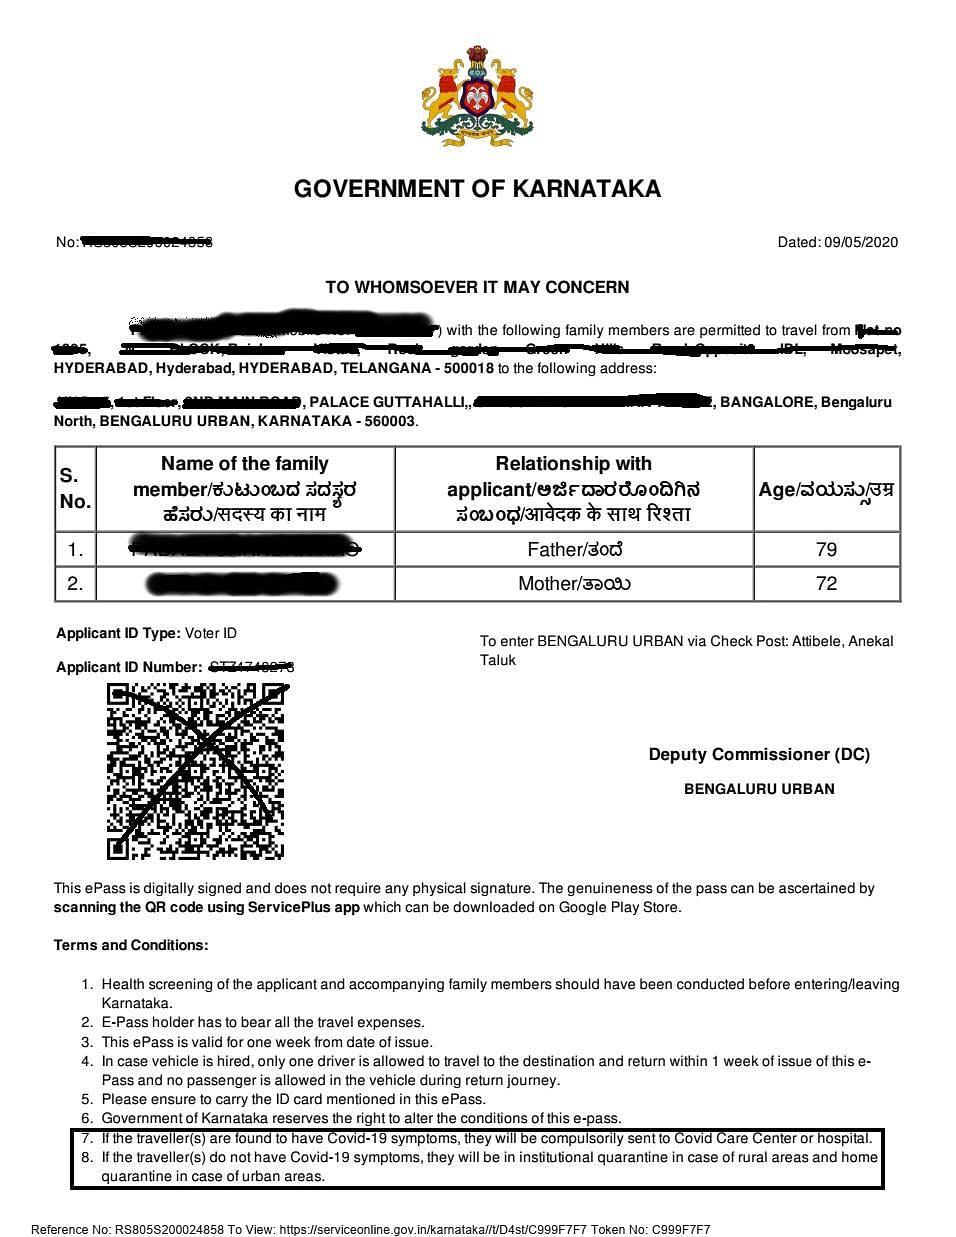 K'taka Govt Sends Back Returnees Unable to Pay For Quarantine